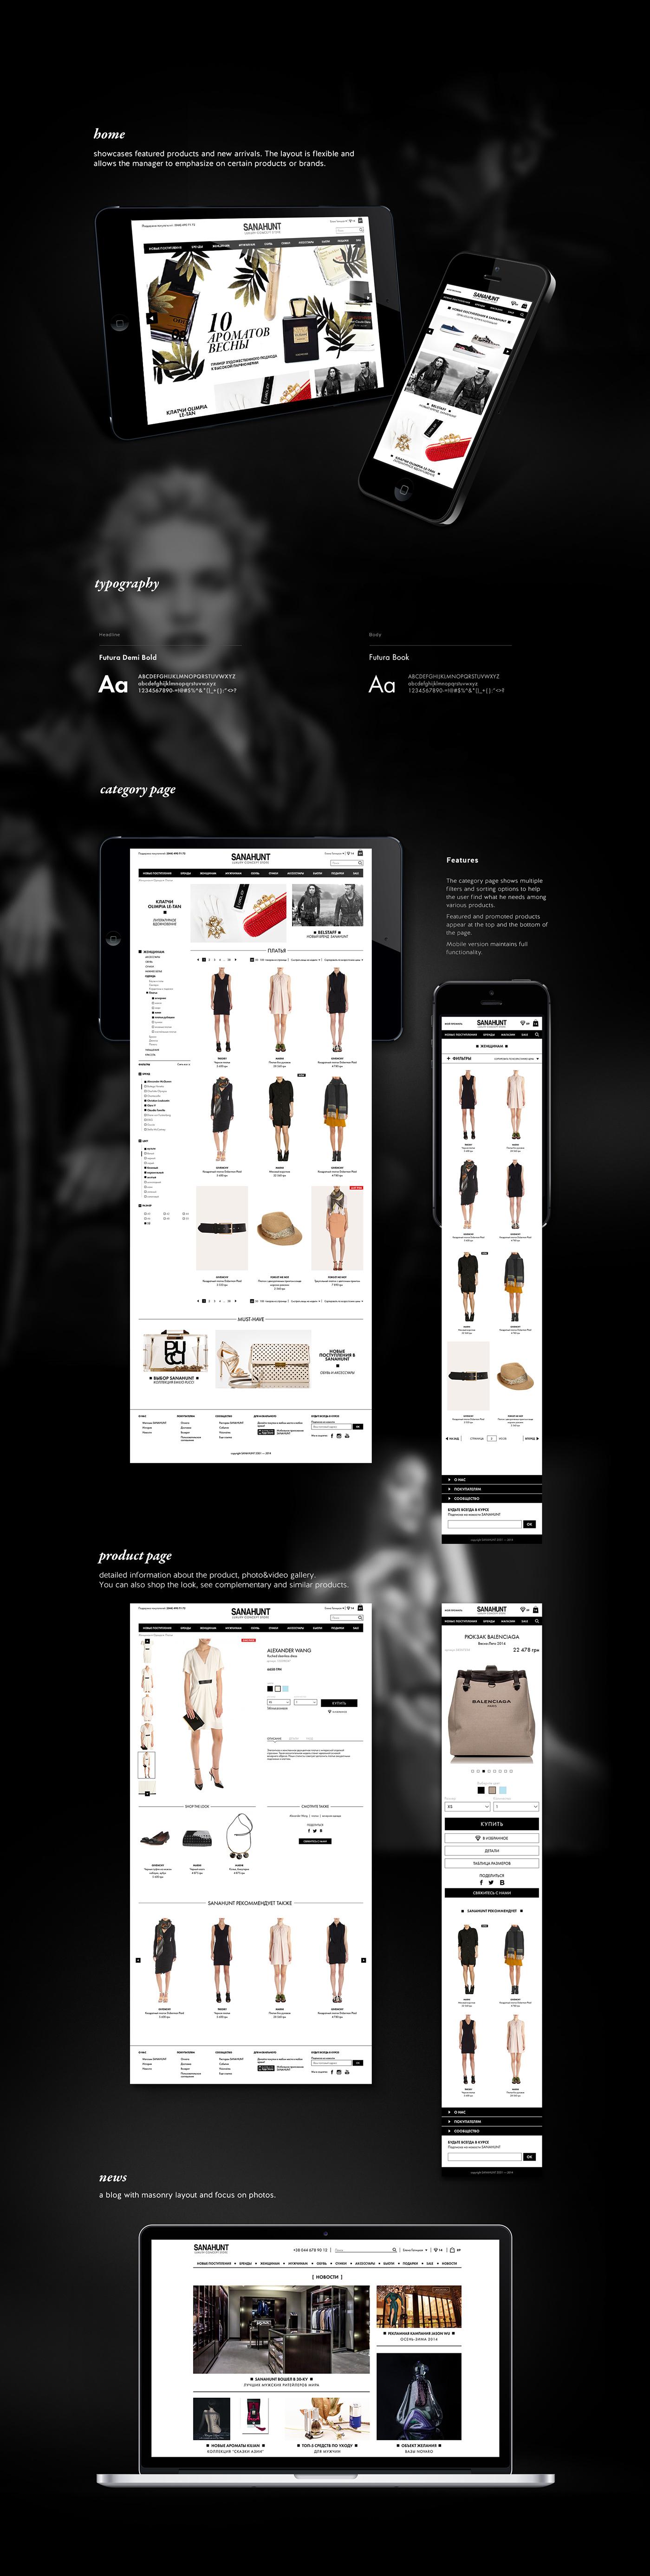 galitsky Sanahunt online store Ecommerce Website apparel design kiev ukraine luxury designstudio studio